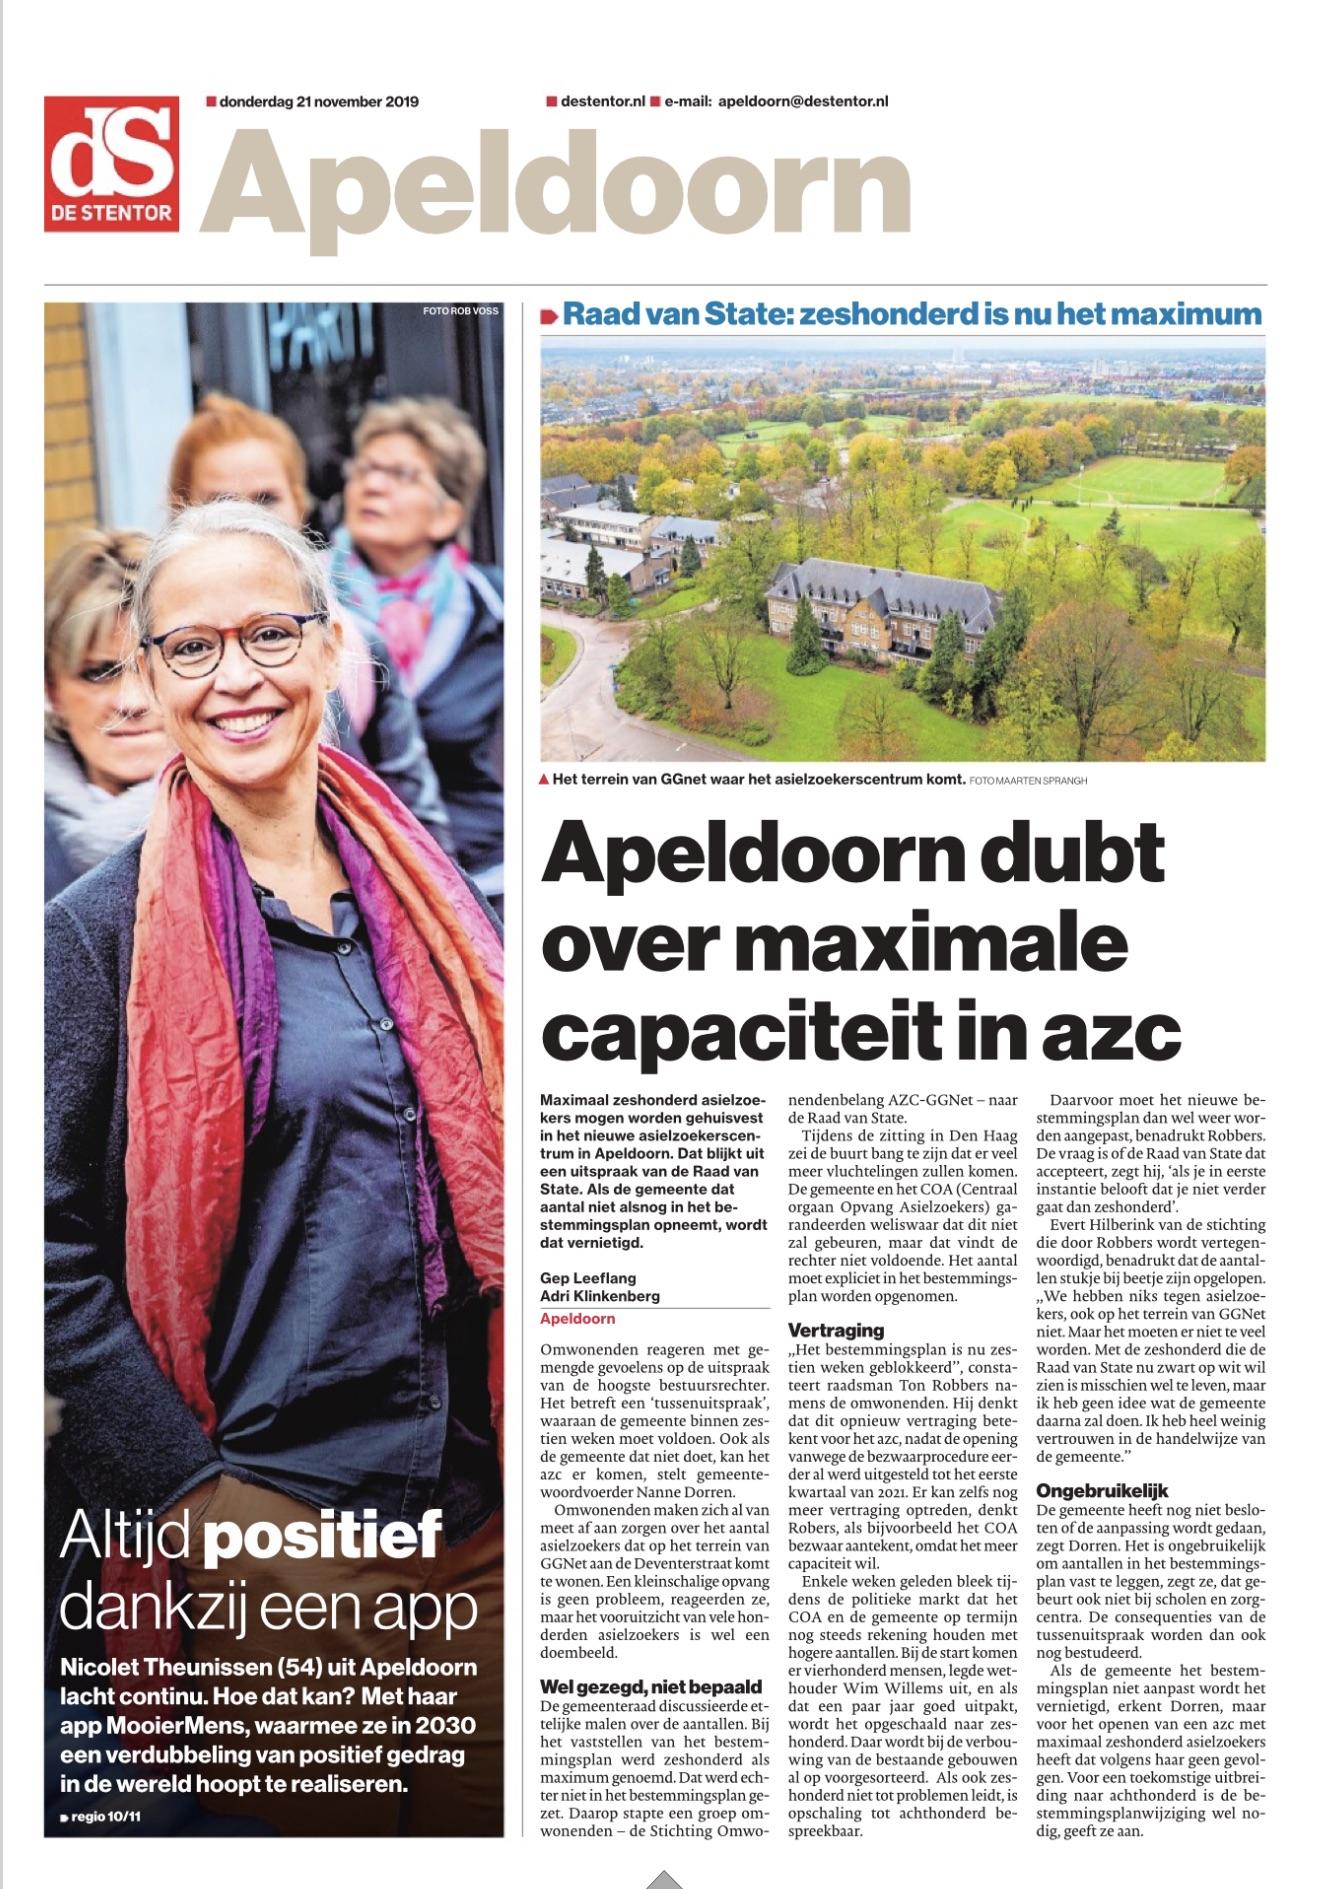 Voorpagina Stentor Apeldoorn katern met aankondiging interview 21-11-2019